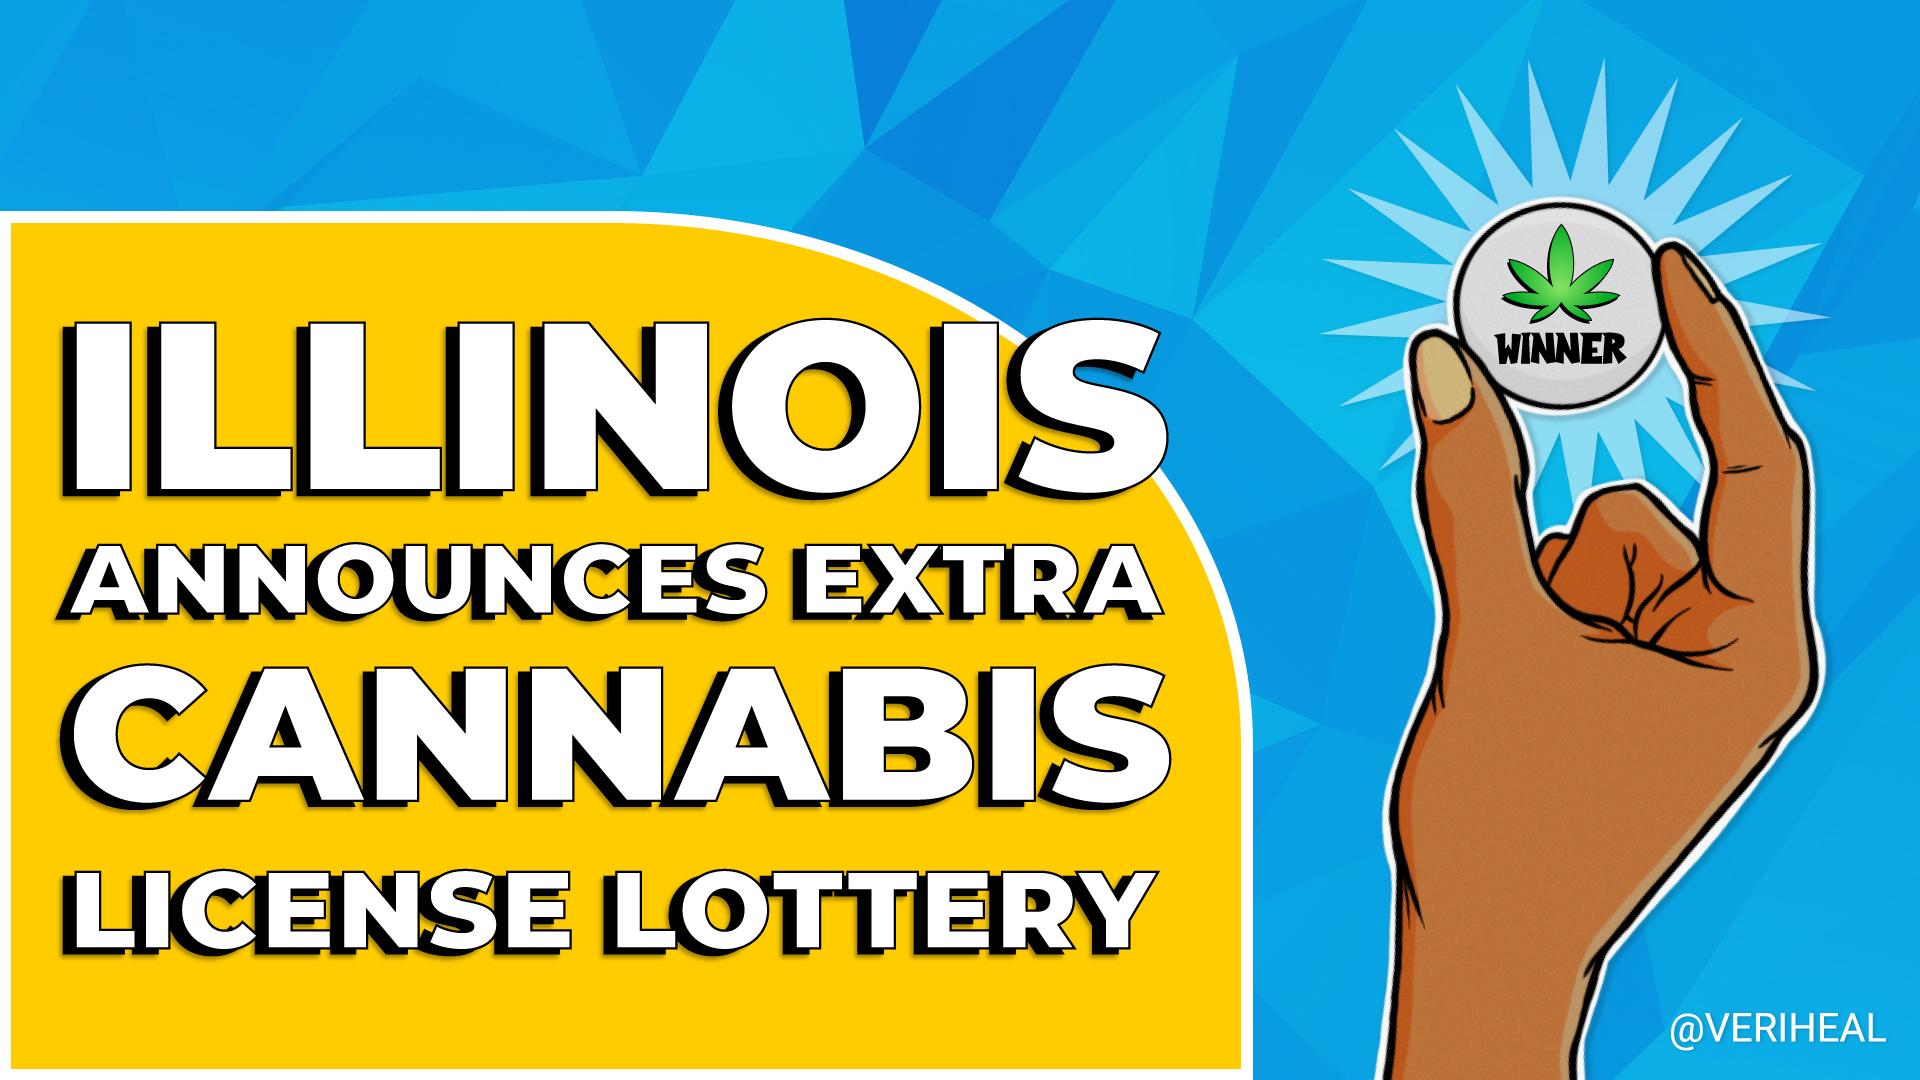 Illinois Announces Extra Cannabis License Lottery